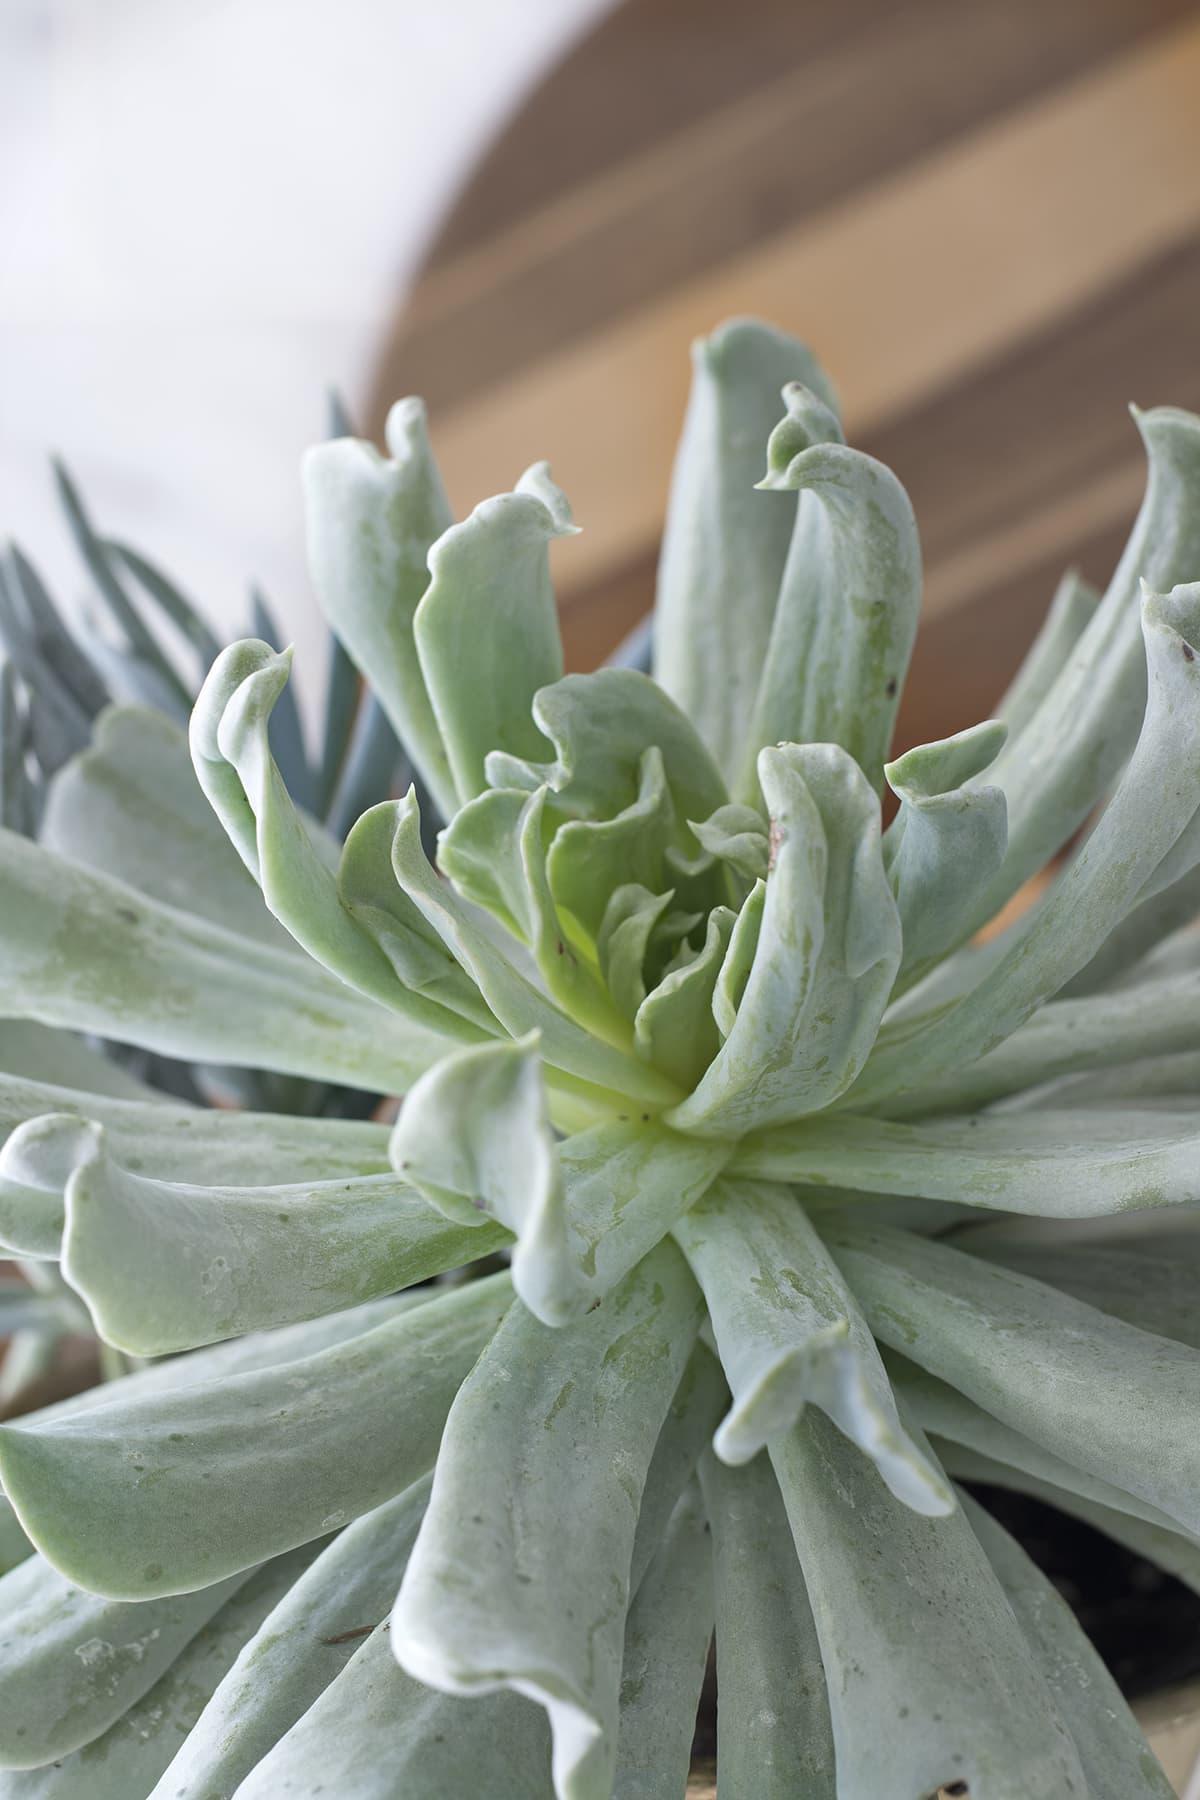 Succulent arrangement idea with different colors and textures